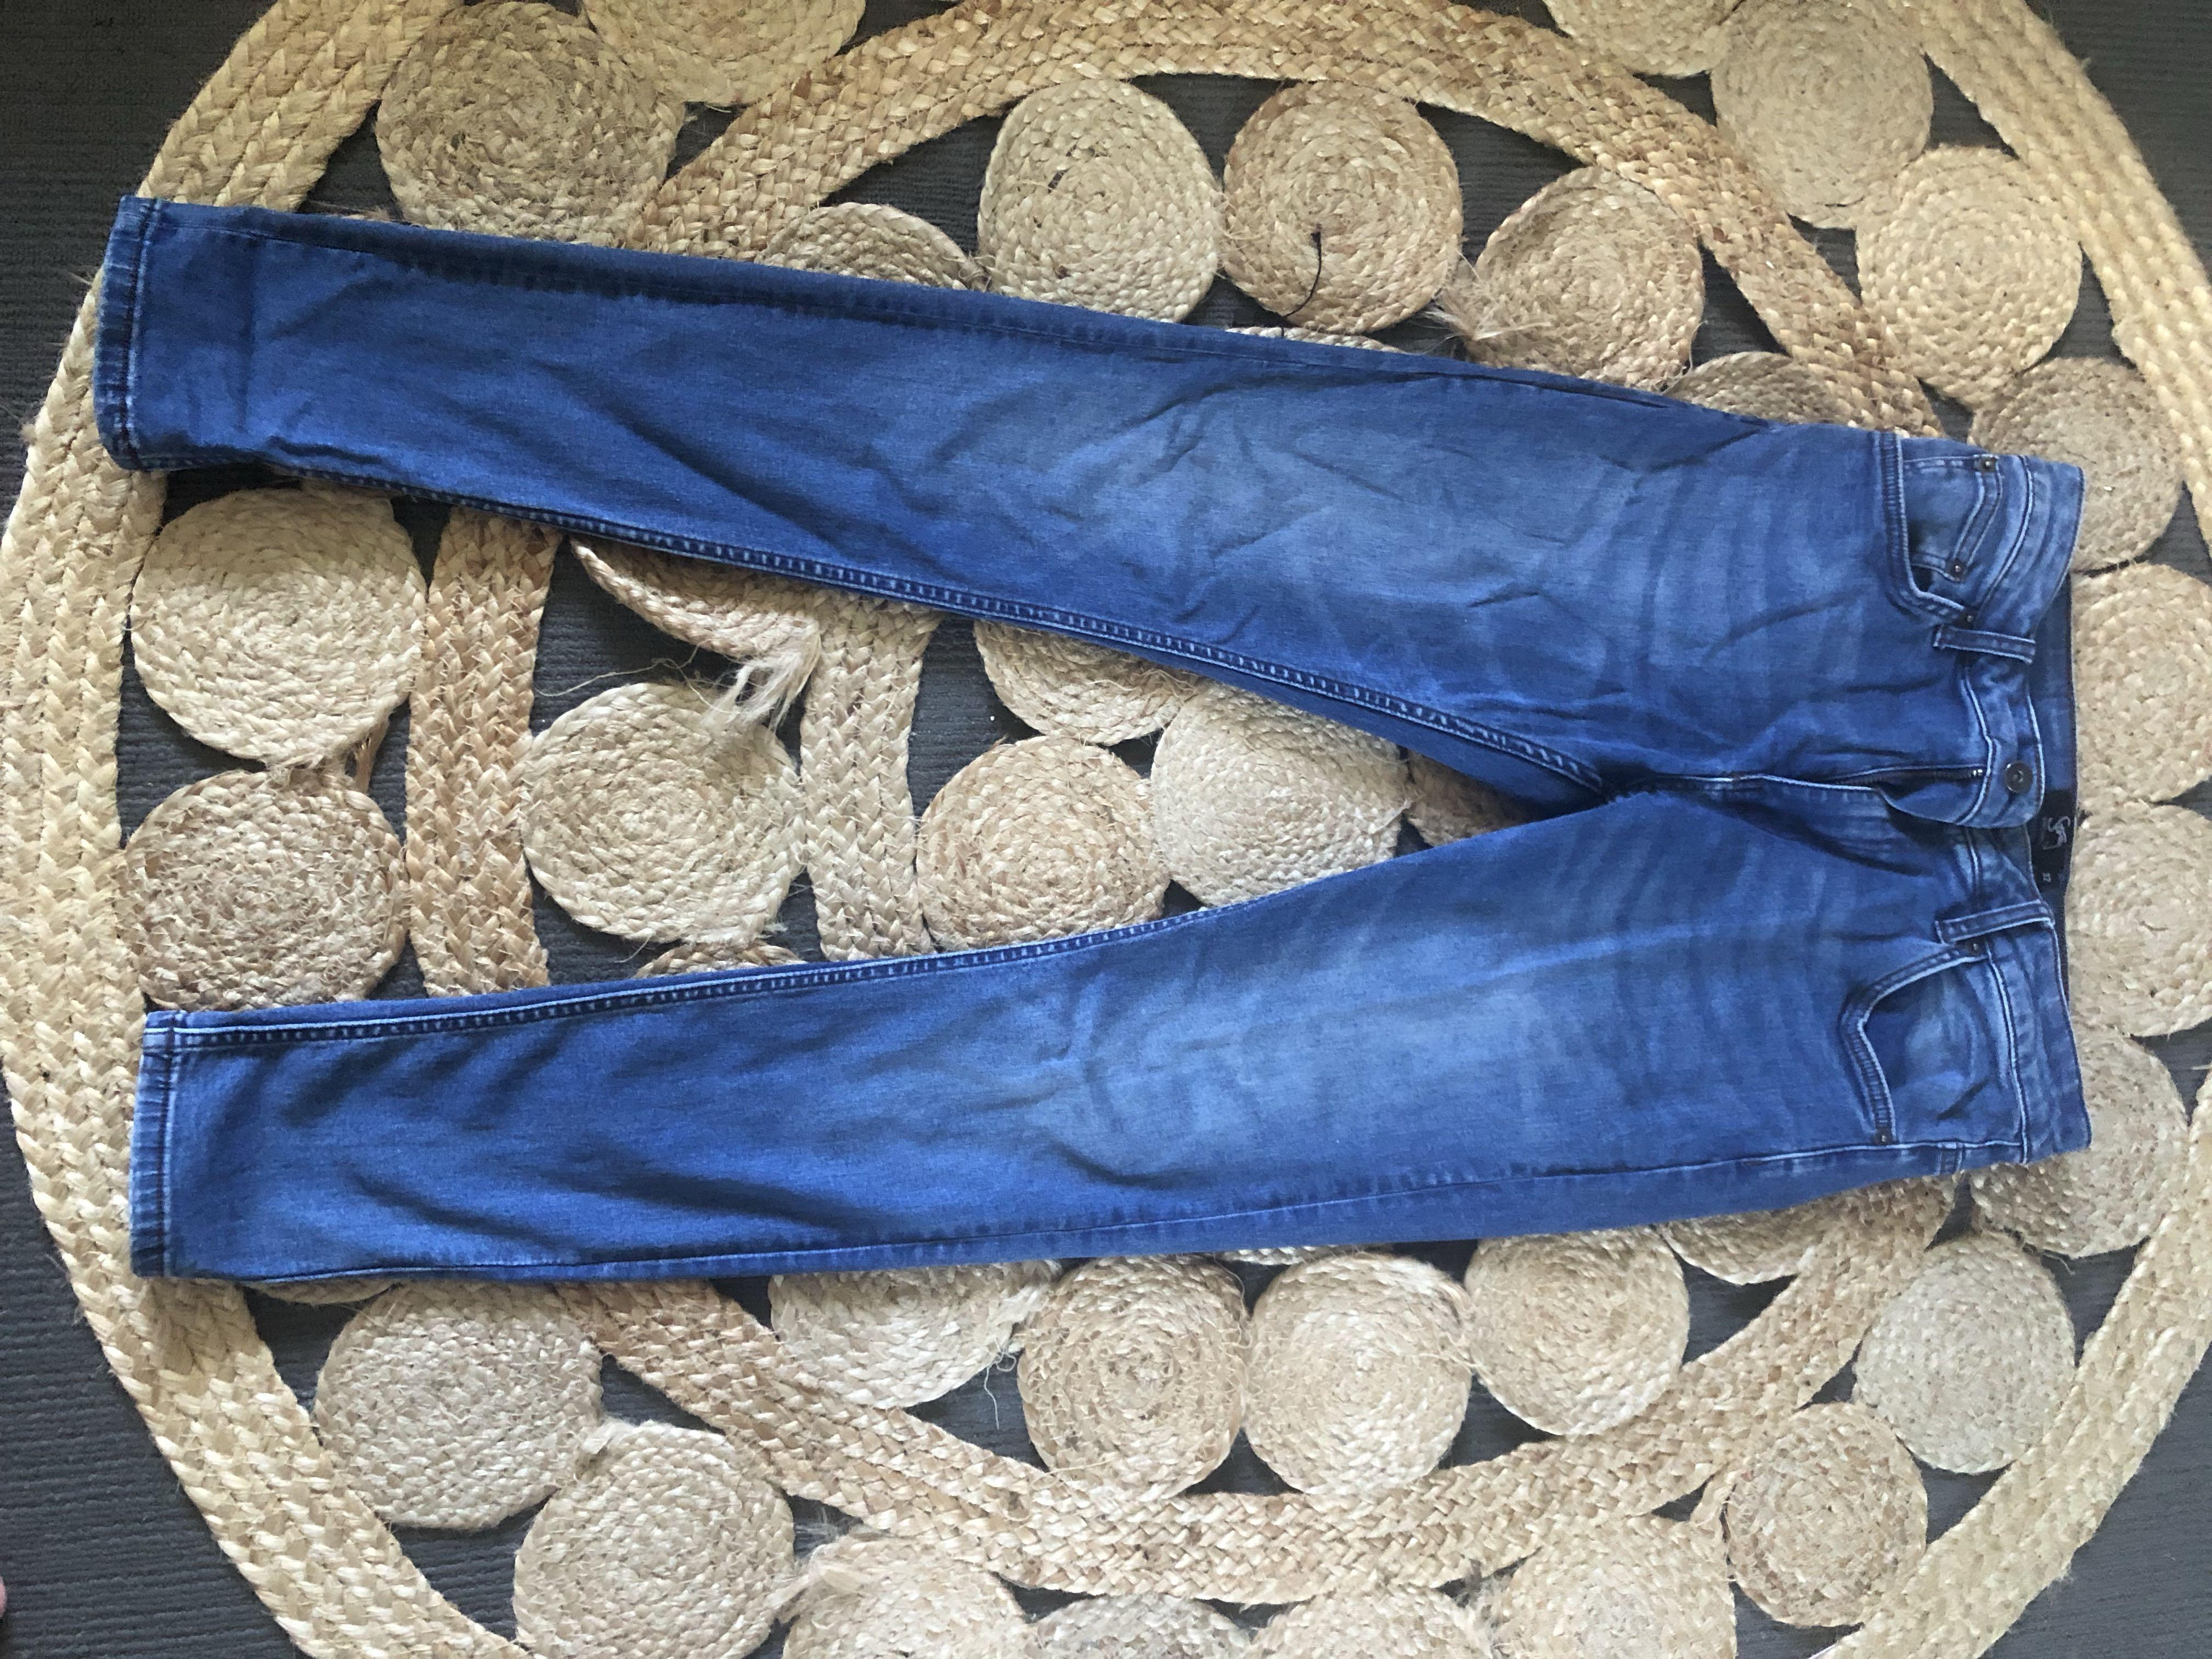 'Stray' jeans